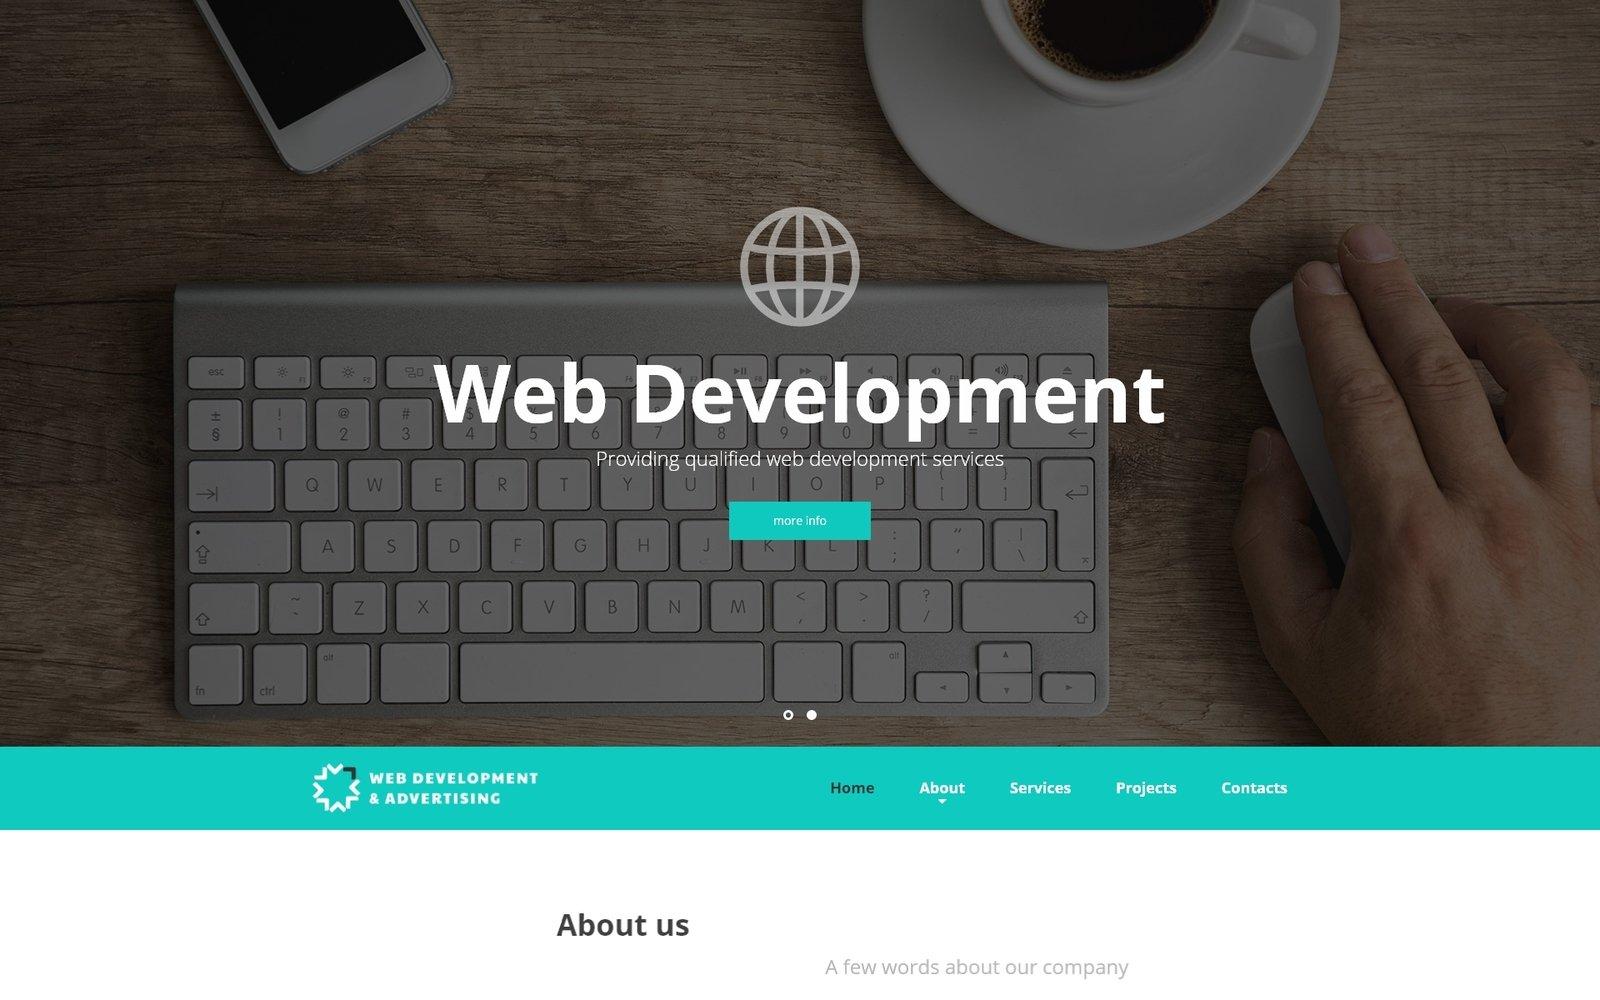 Reszponzív Web Development & Advertising - Web Development Responsive Weboldal sablon 52537